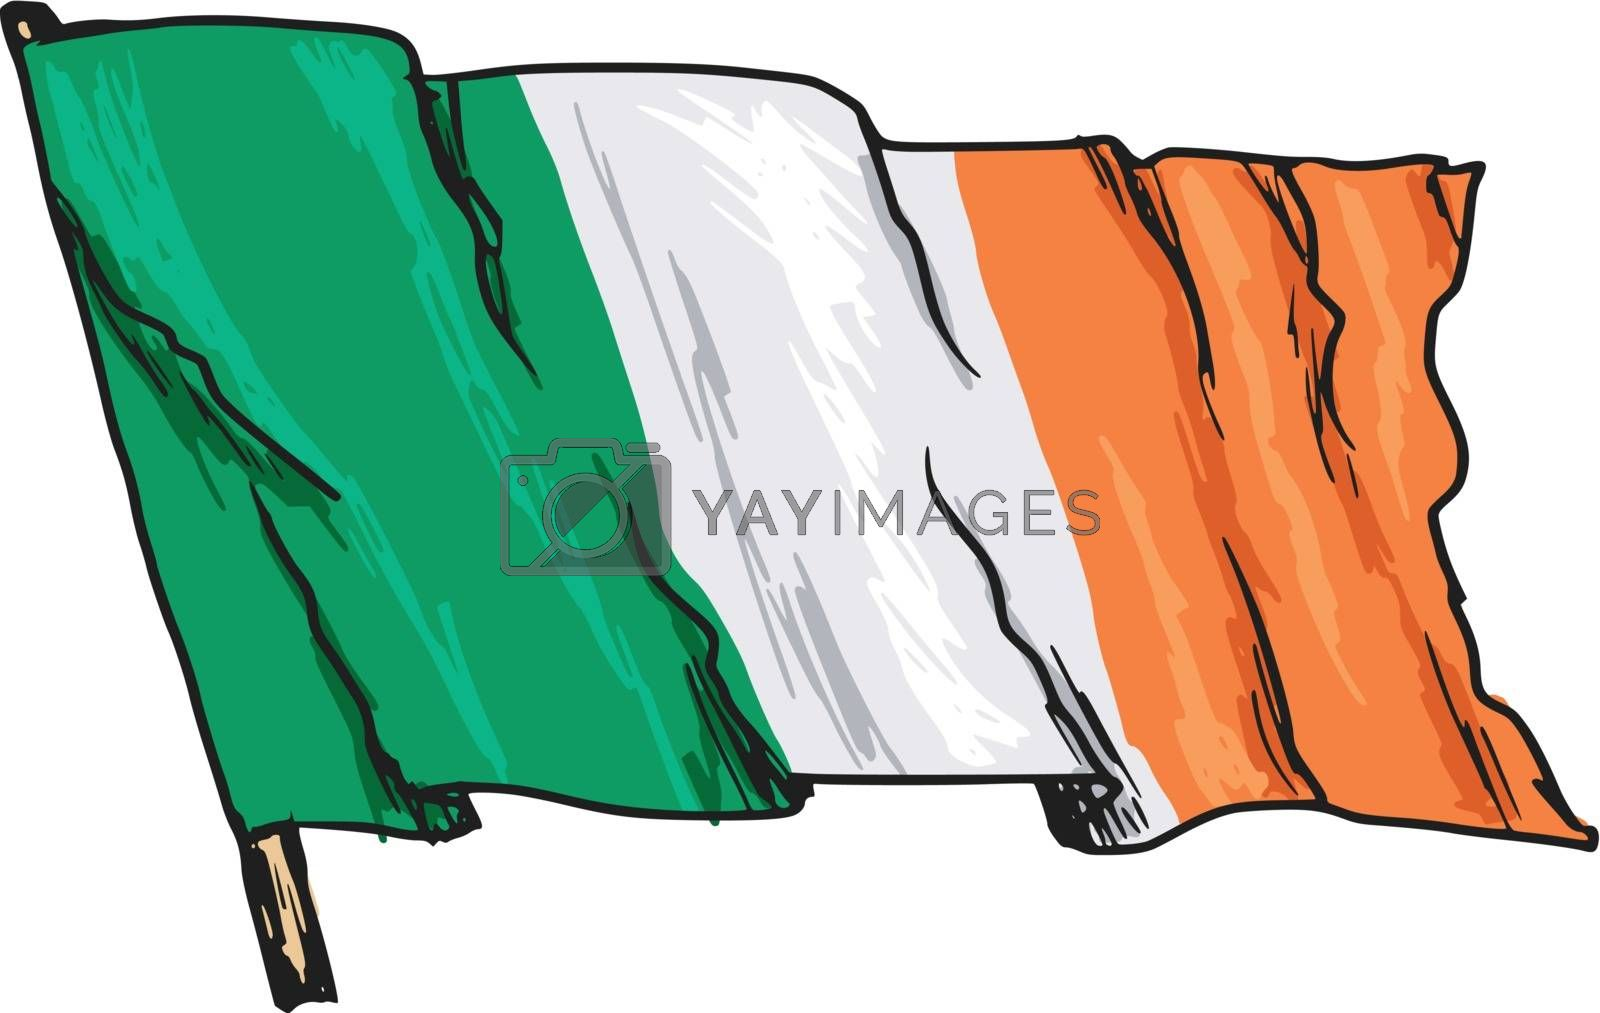 hand drawn, sketch, illustration of flag of Ireland